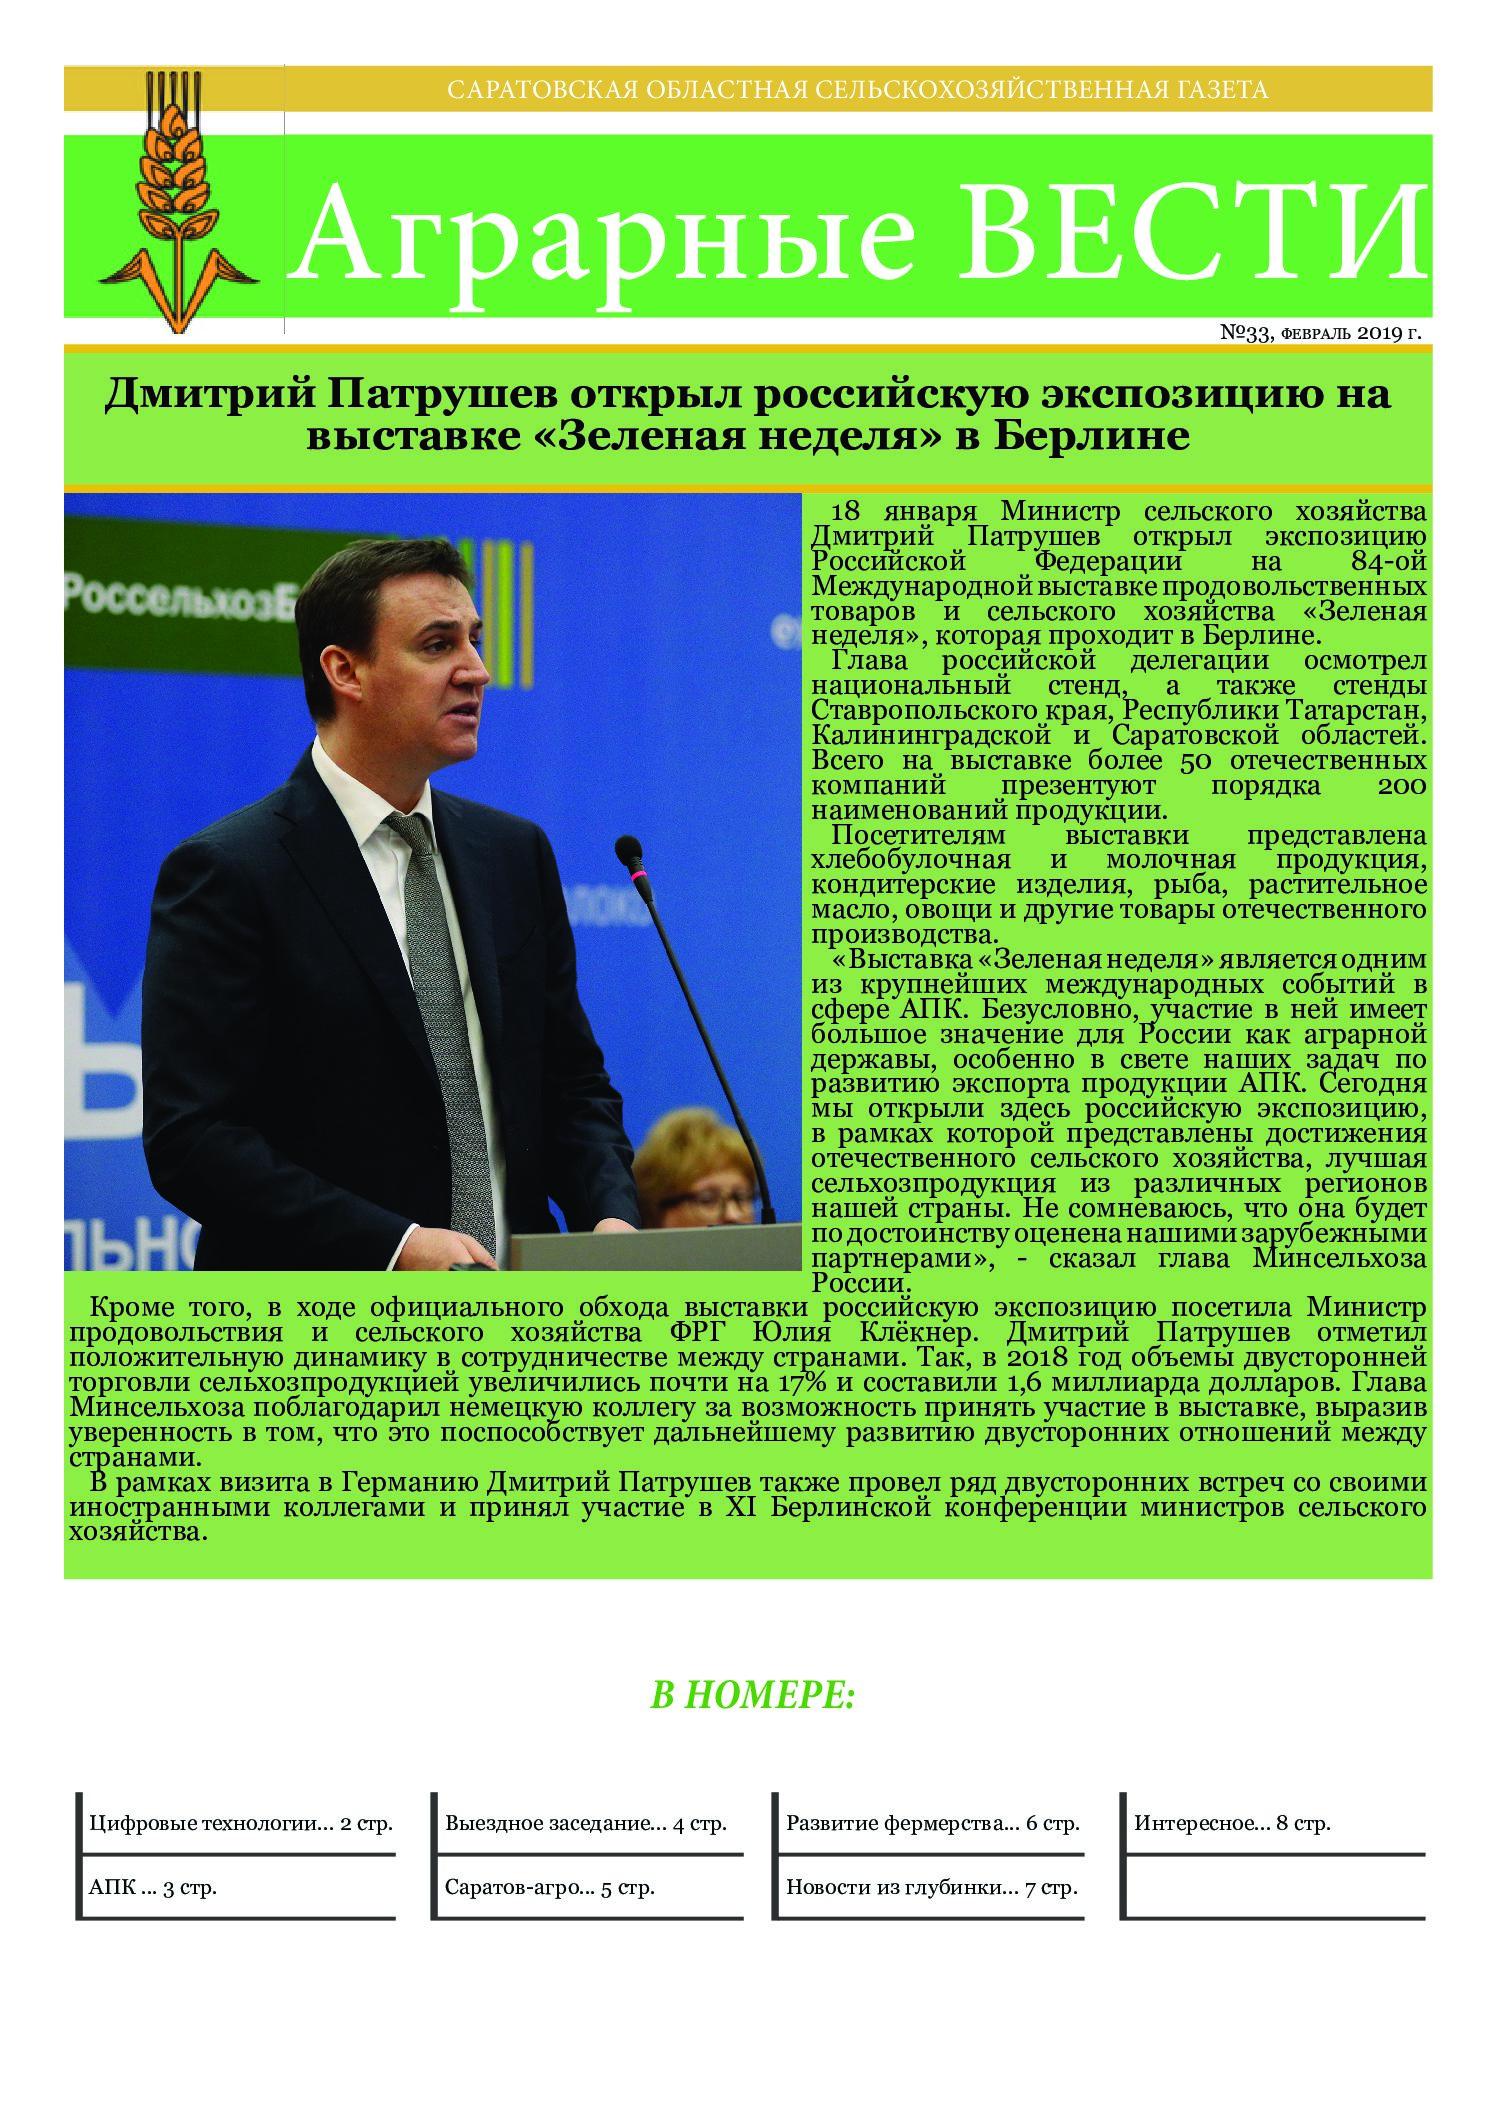 https://saratovagro.ru/wp-content/uploads/2020/08/33-pdf.jpg